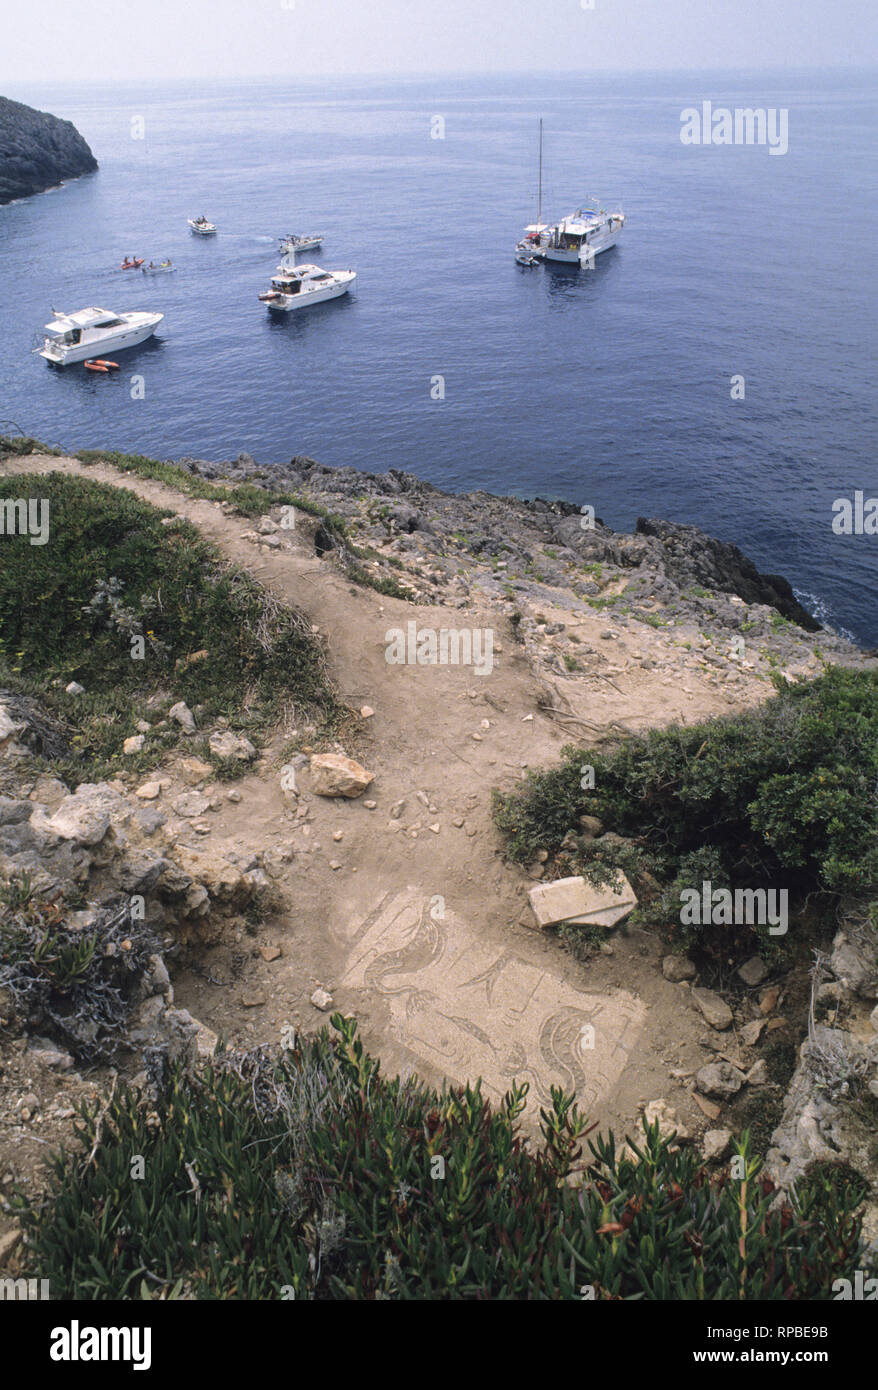 giannutri island, grosseto province, toscana (tuscany), italy - Stock Image